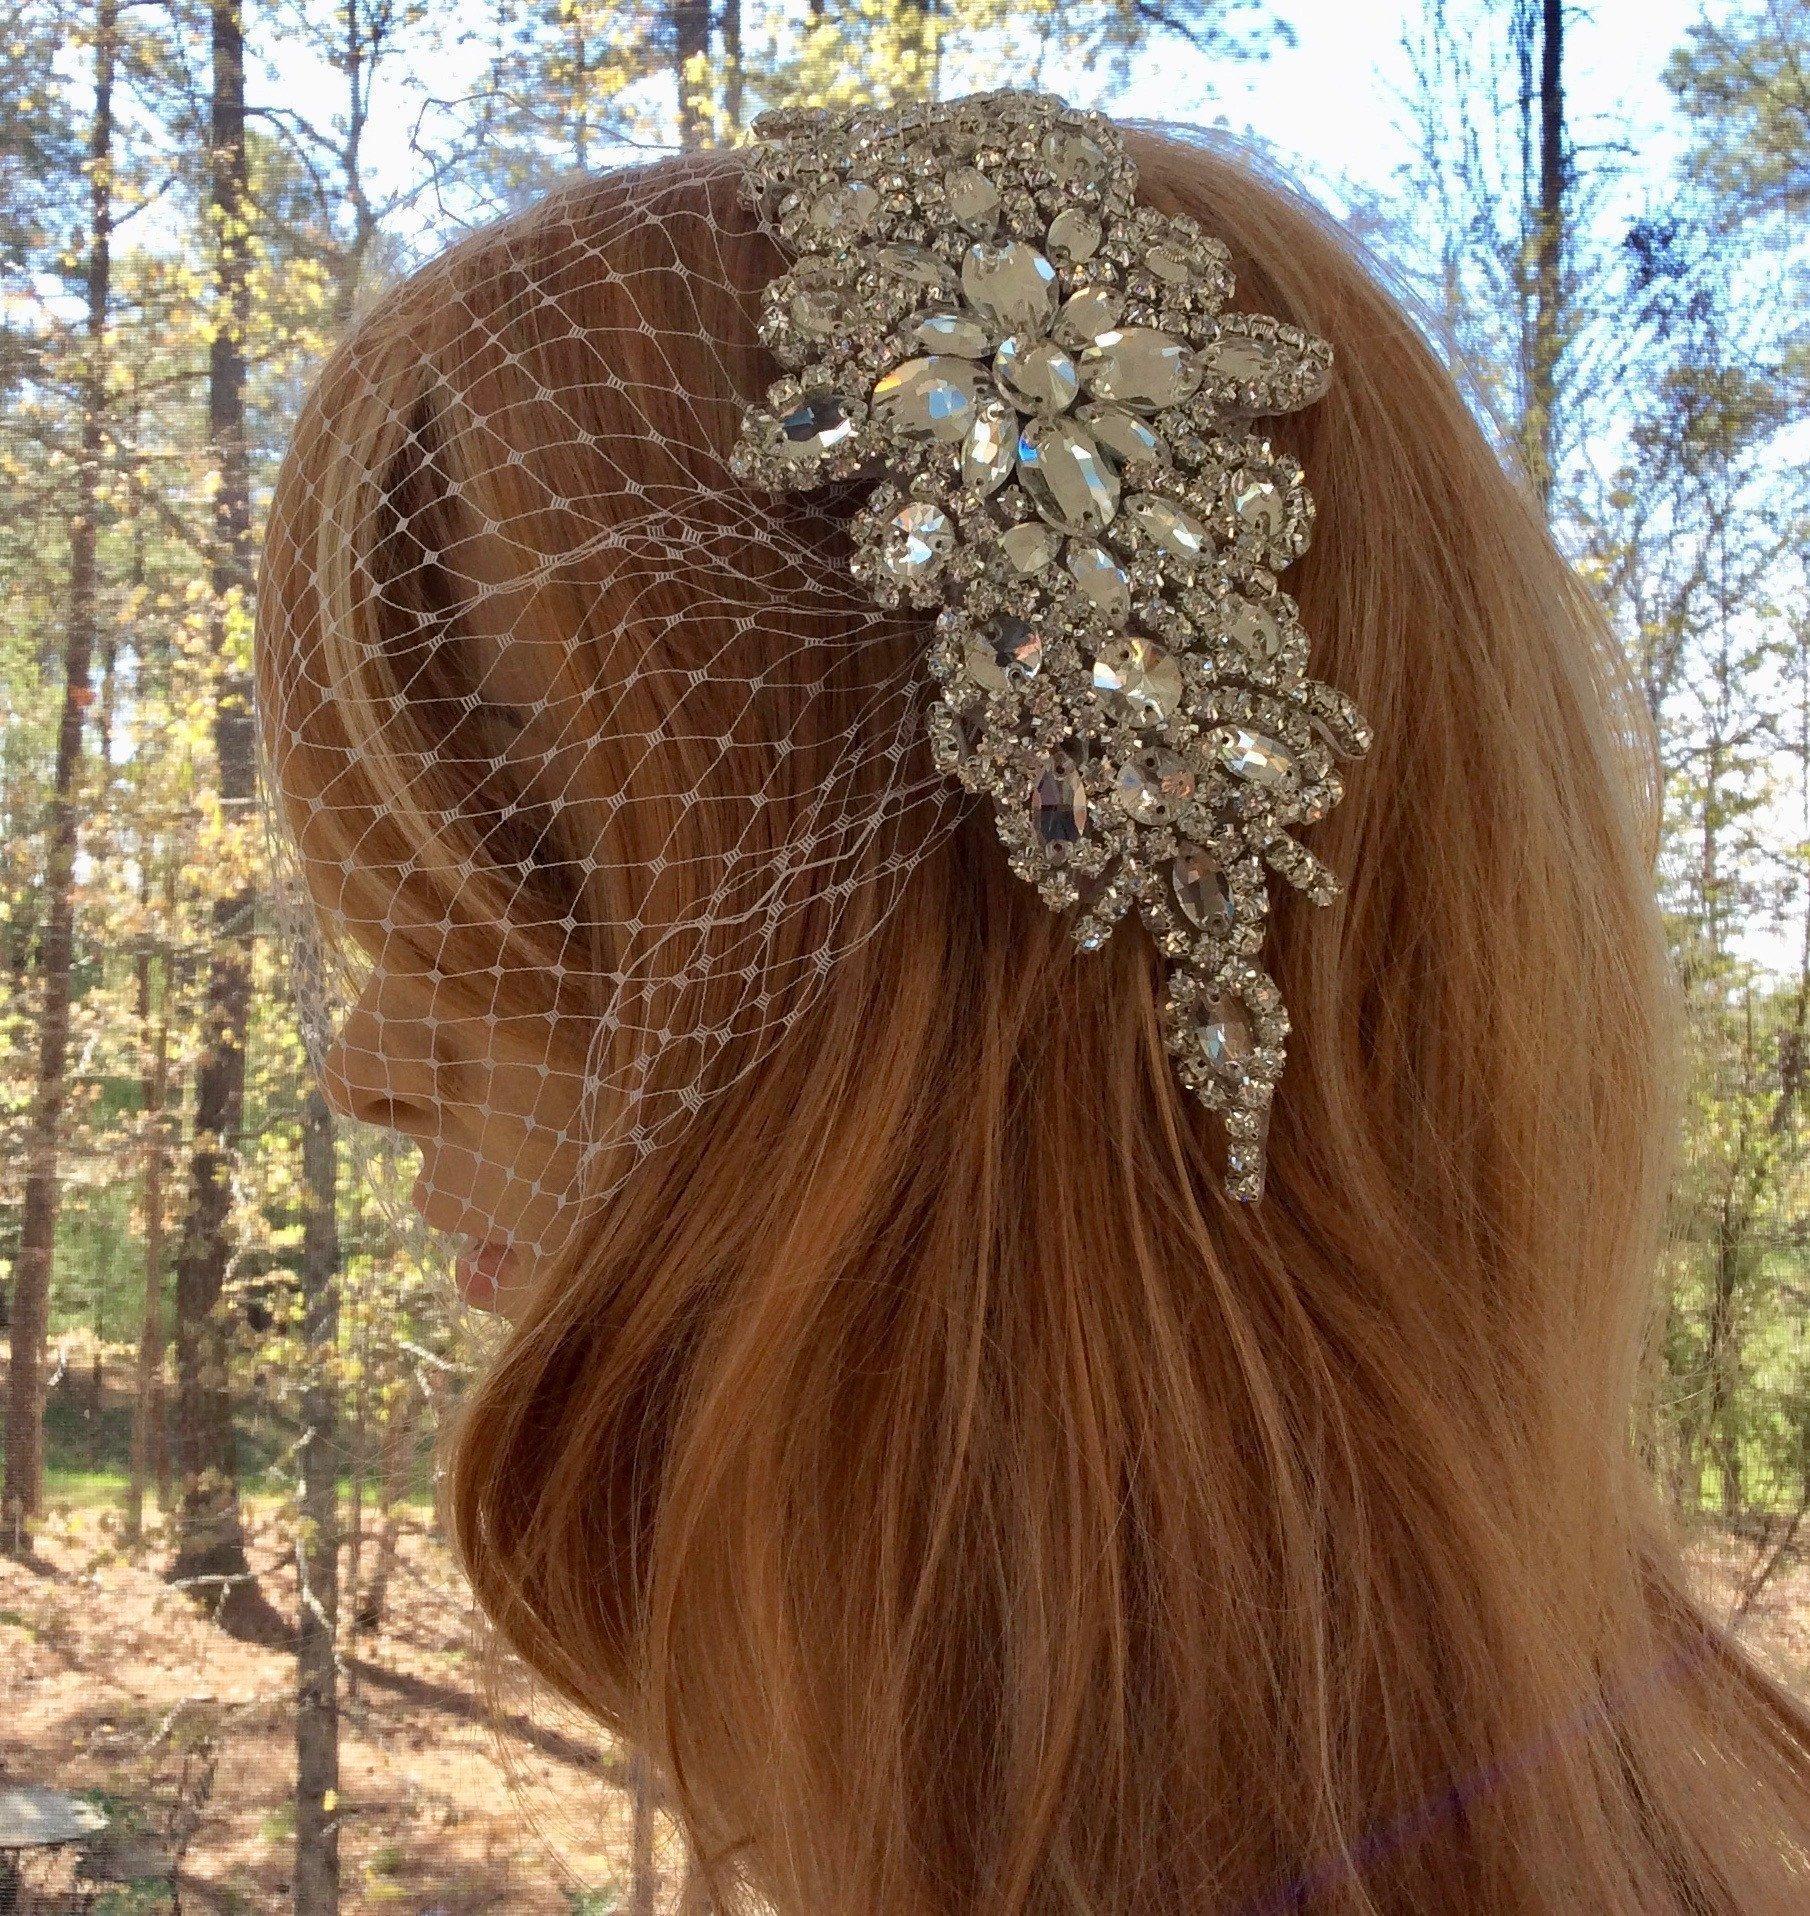 Bridal Veil With Rhinestone Comb, Wedding Veil and Headpiece, White or Ivory Veil